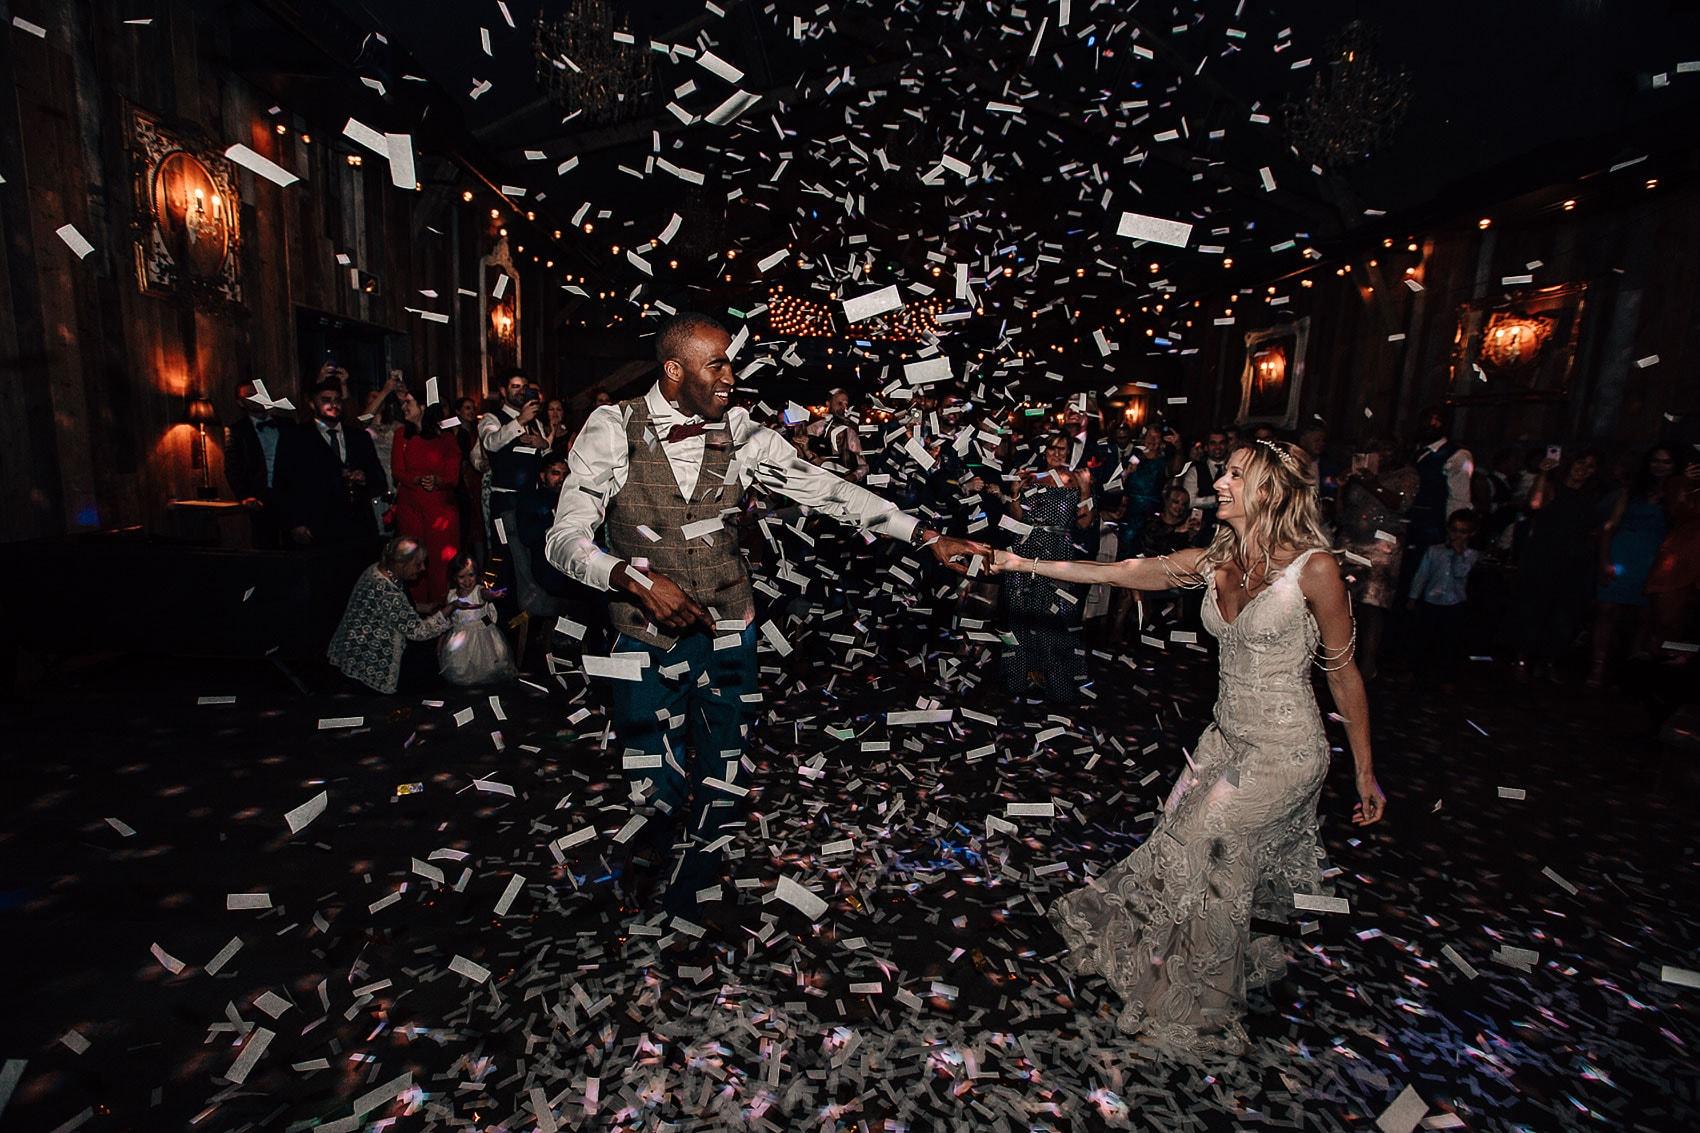 Yorkshire wedding dance-floor photography Wharfedale Grange